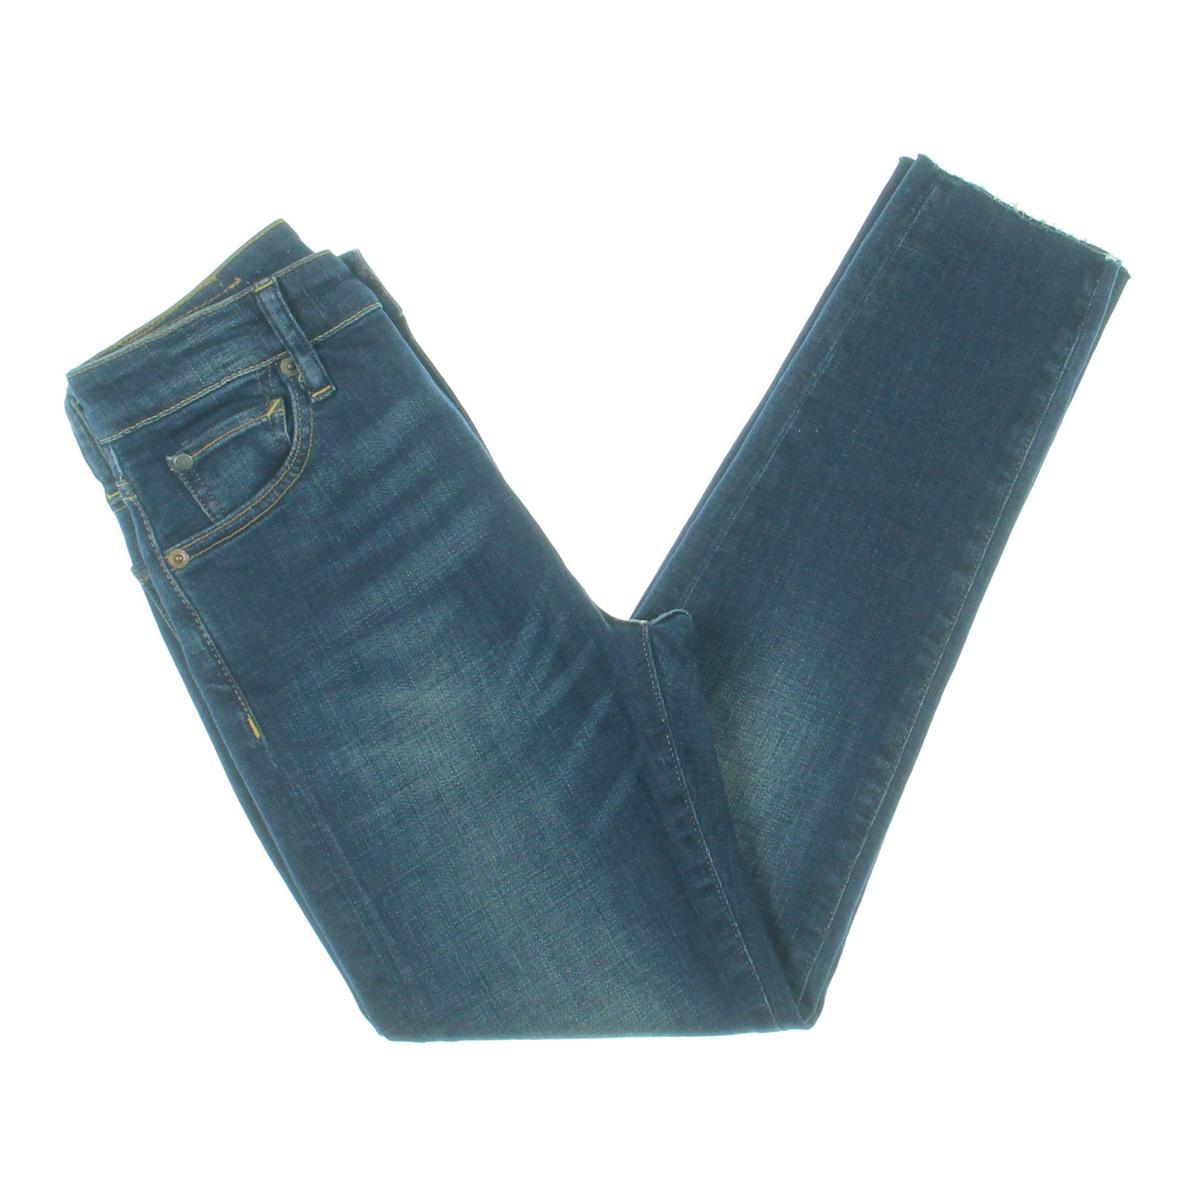 Denim & Supply Ralph Lauren Womens bluee Cropped Skinny Jeans 28 BHFO 2830